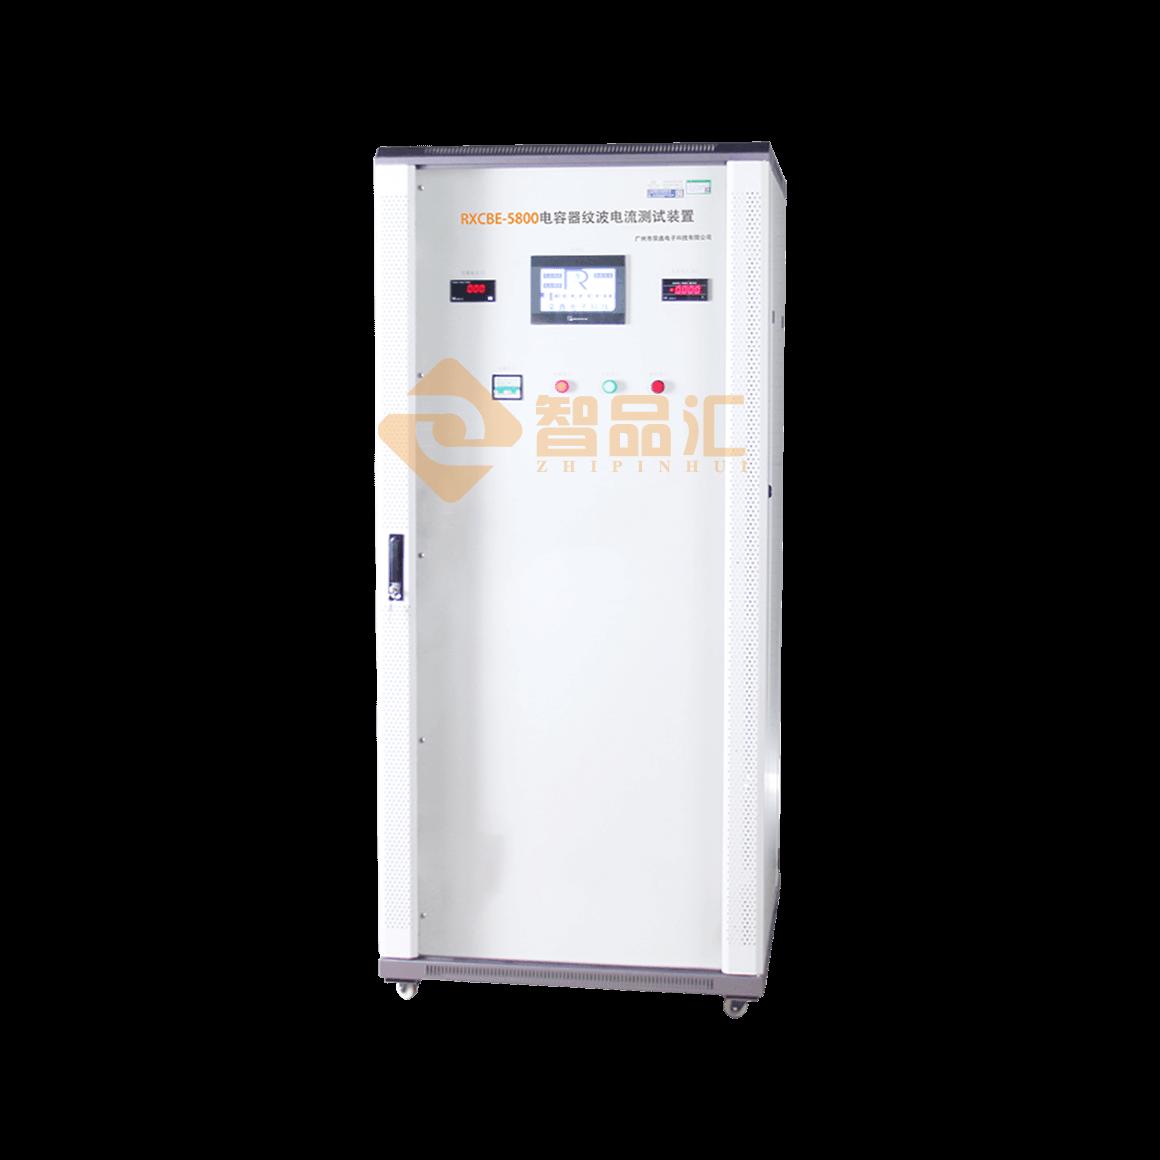 RXCBE-5800电容器纹波电流测试装置右侧面大.png